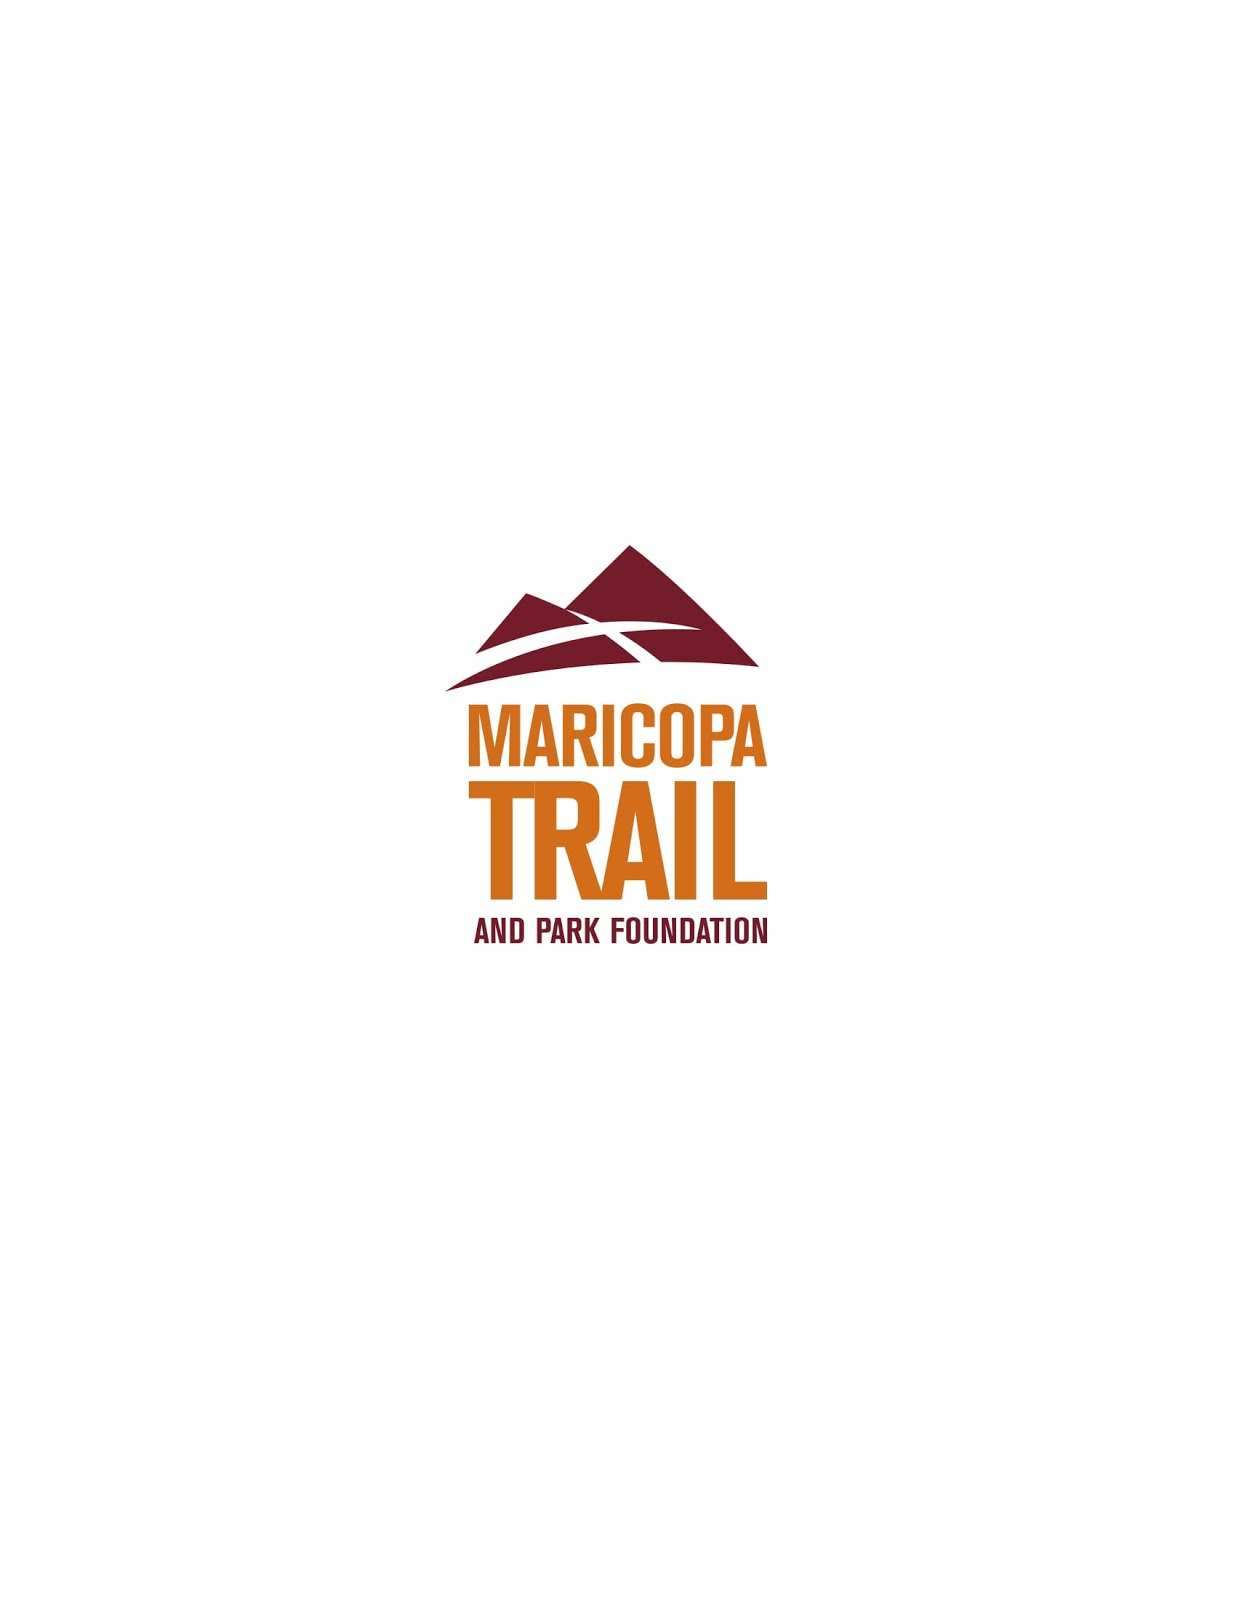 Maricopa Trail and Park Foundation